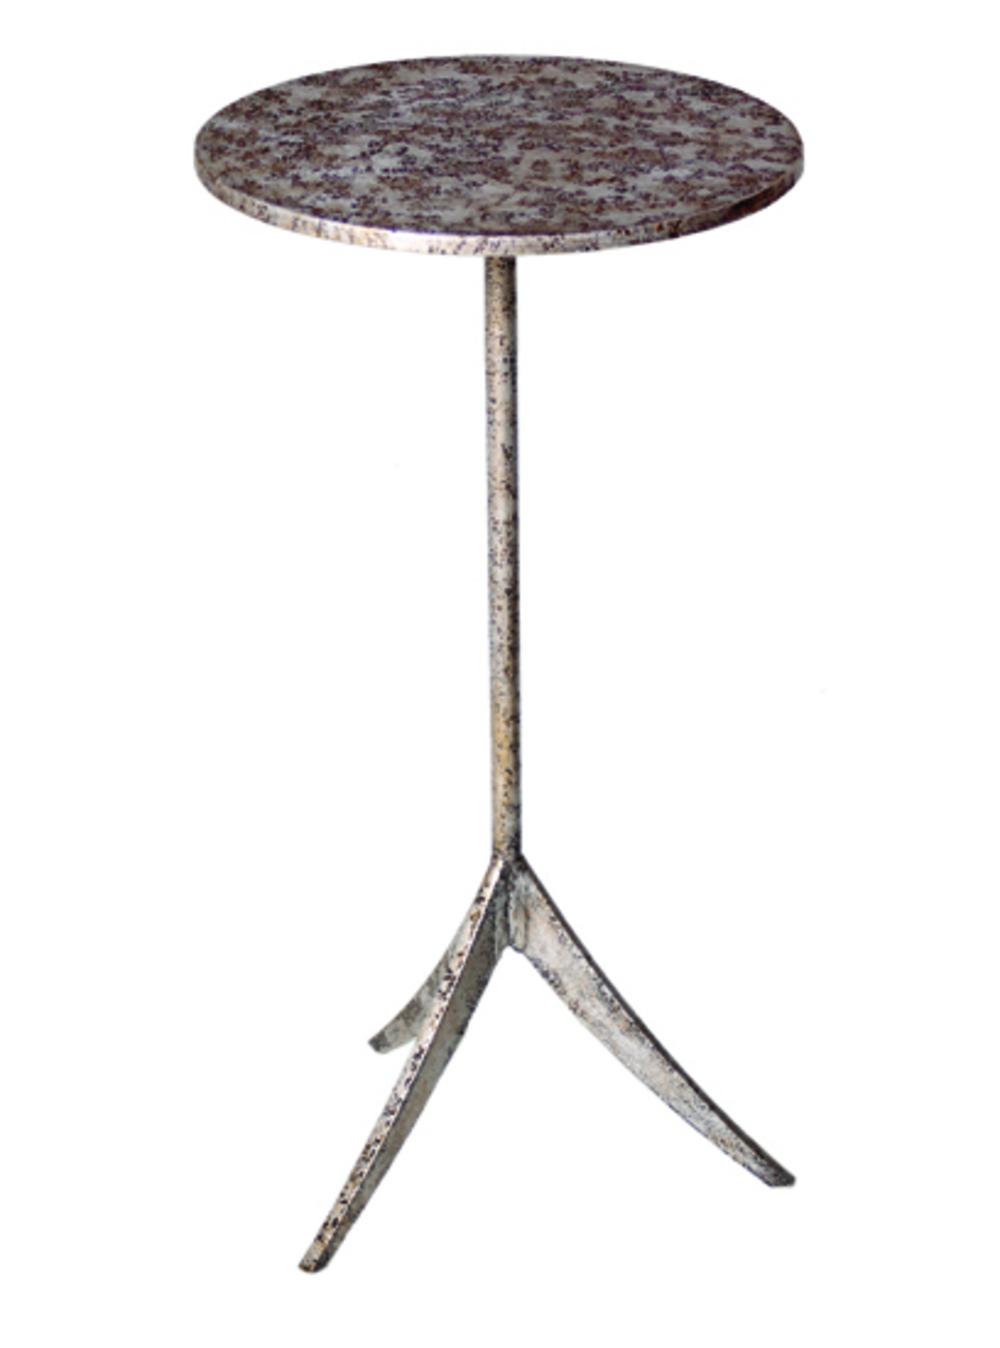 Charleston Forge - Stiletto Drink Table